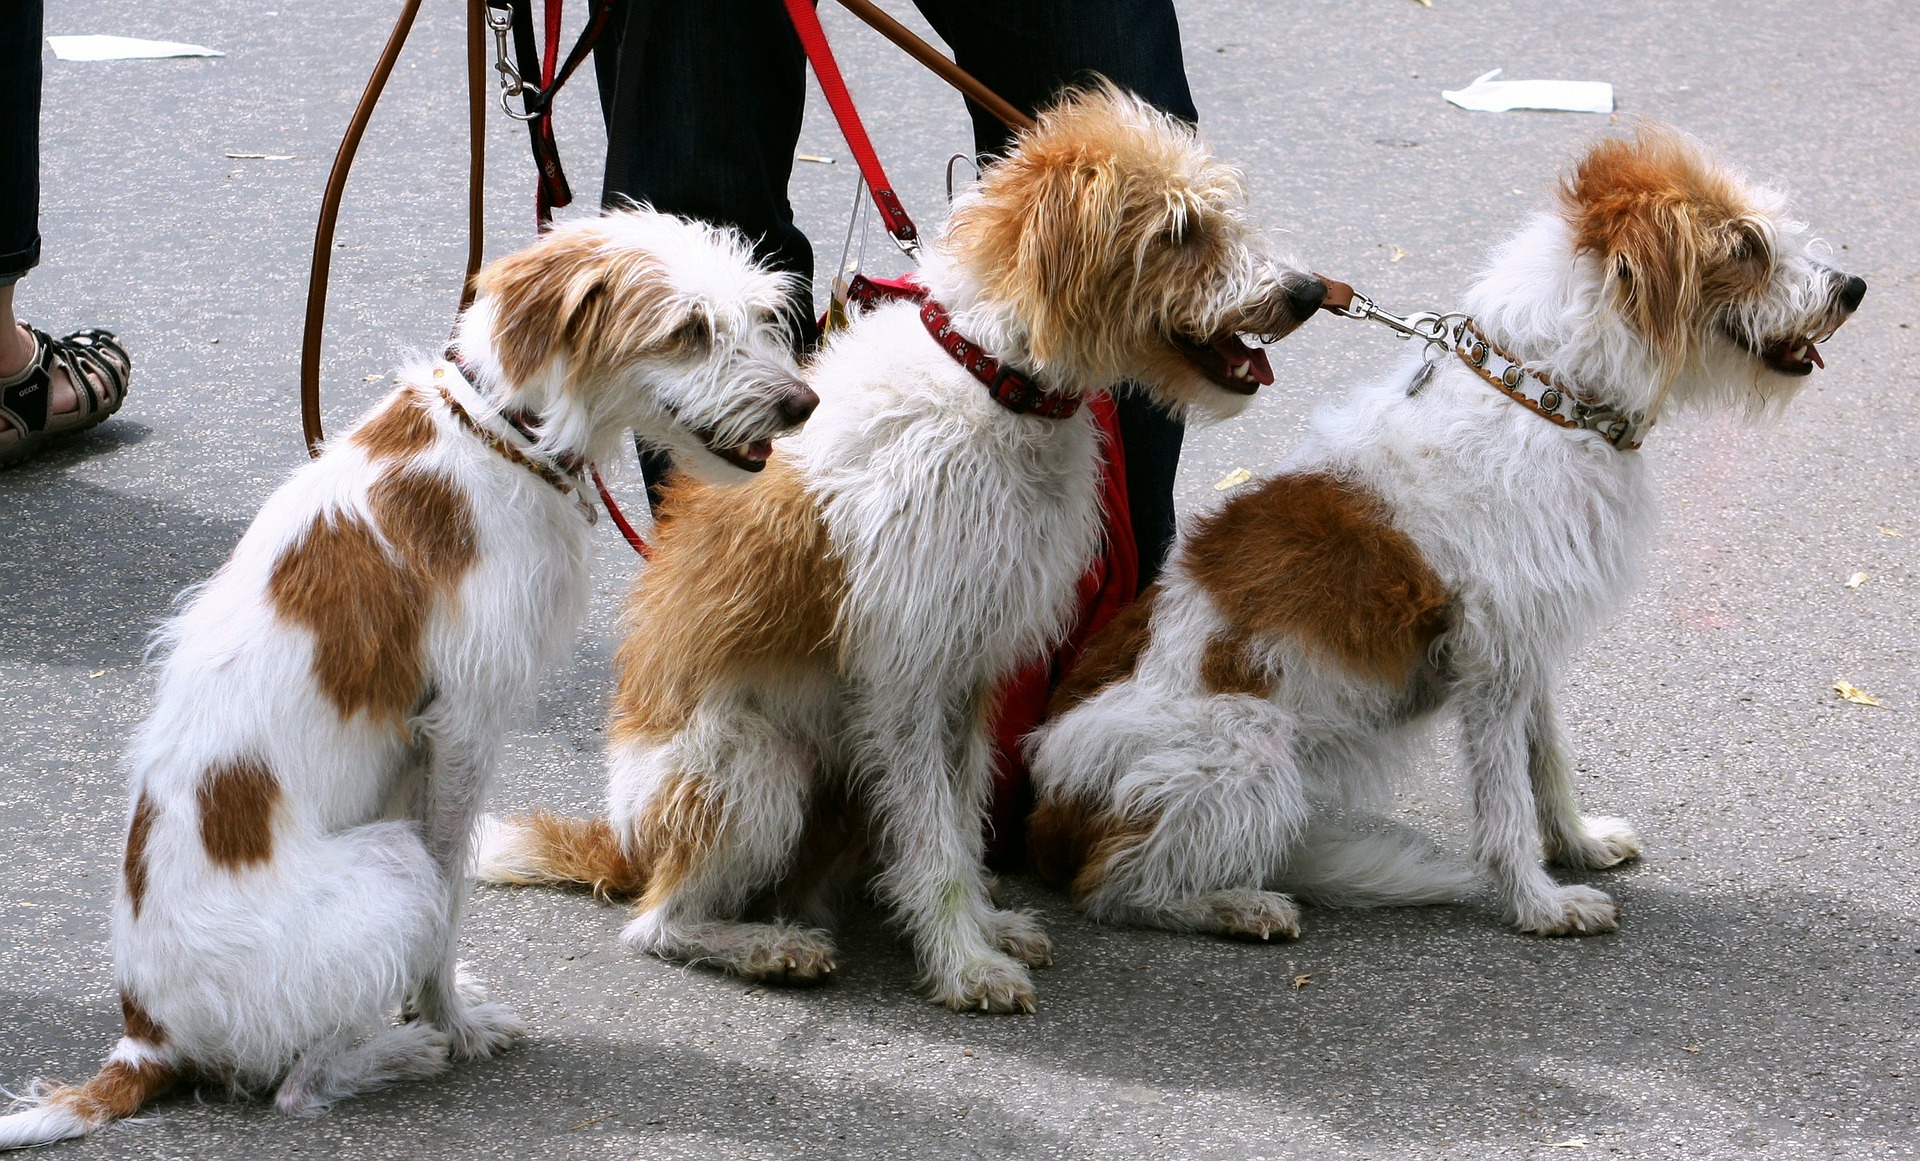 dogs-91689_1920.jpg